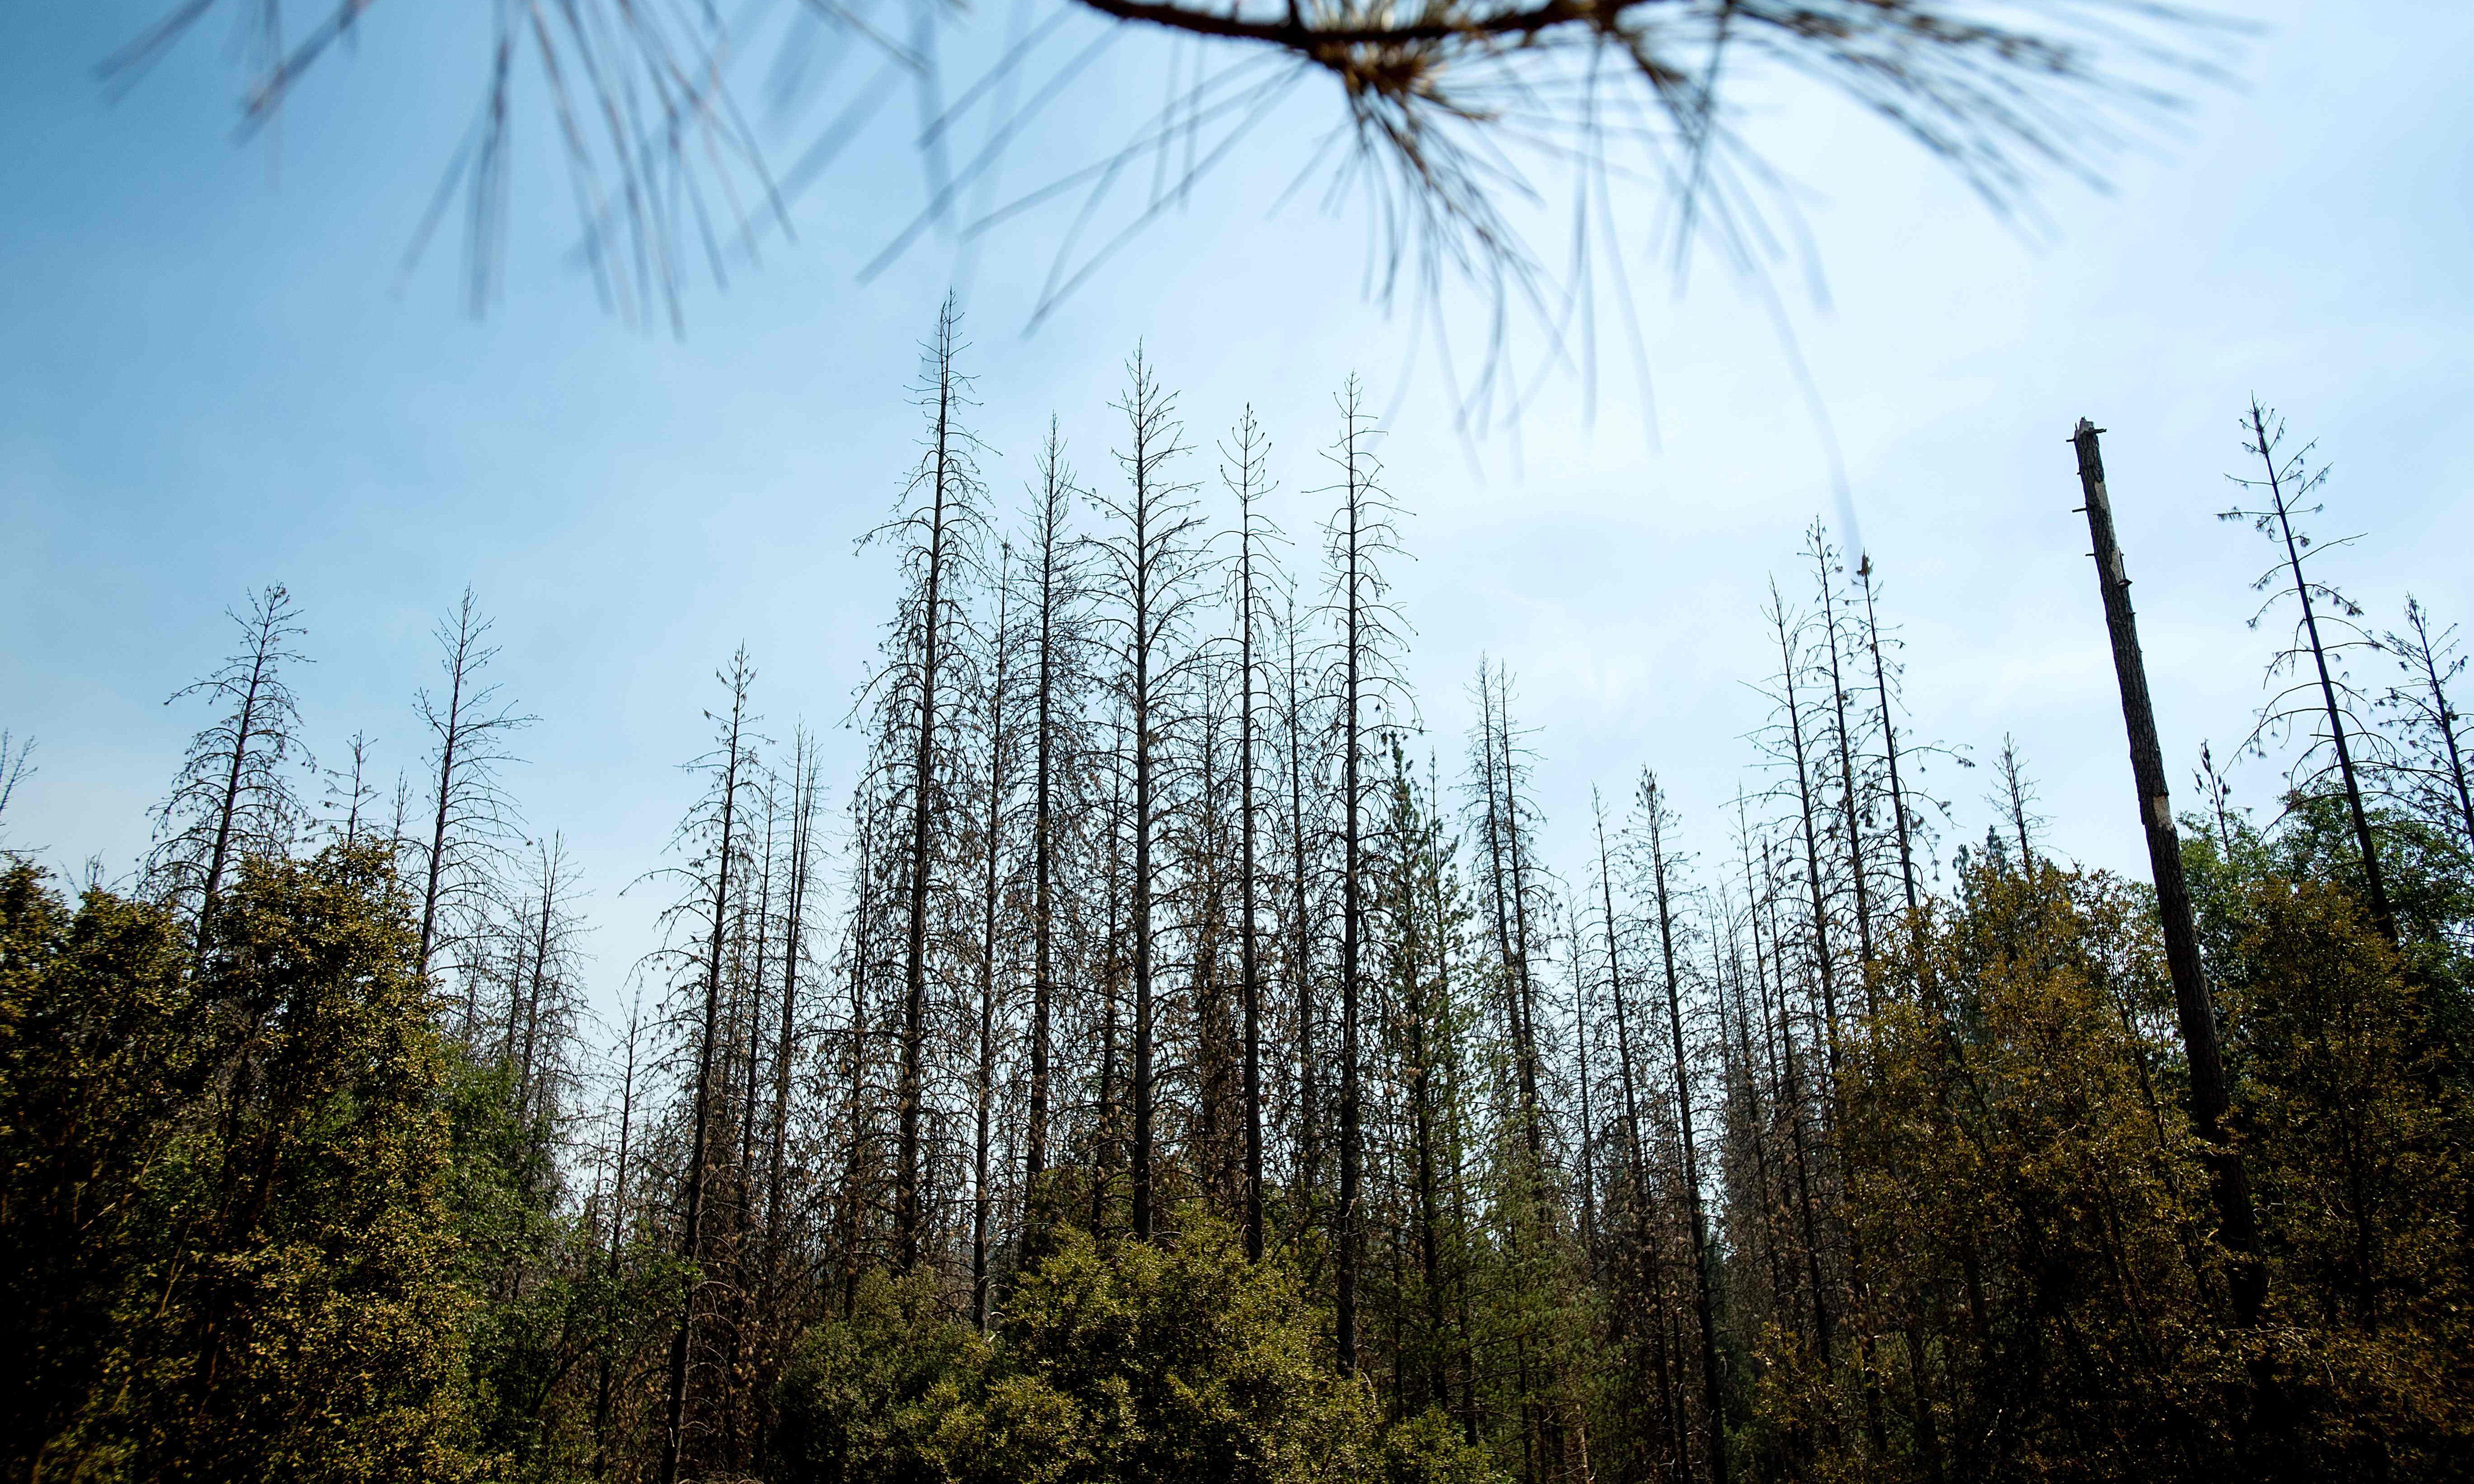 Tree-damaging pests pose 'devastating' threat to 40% of US forests